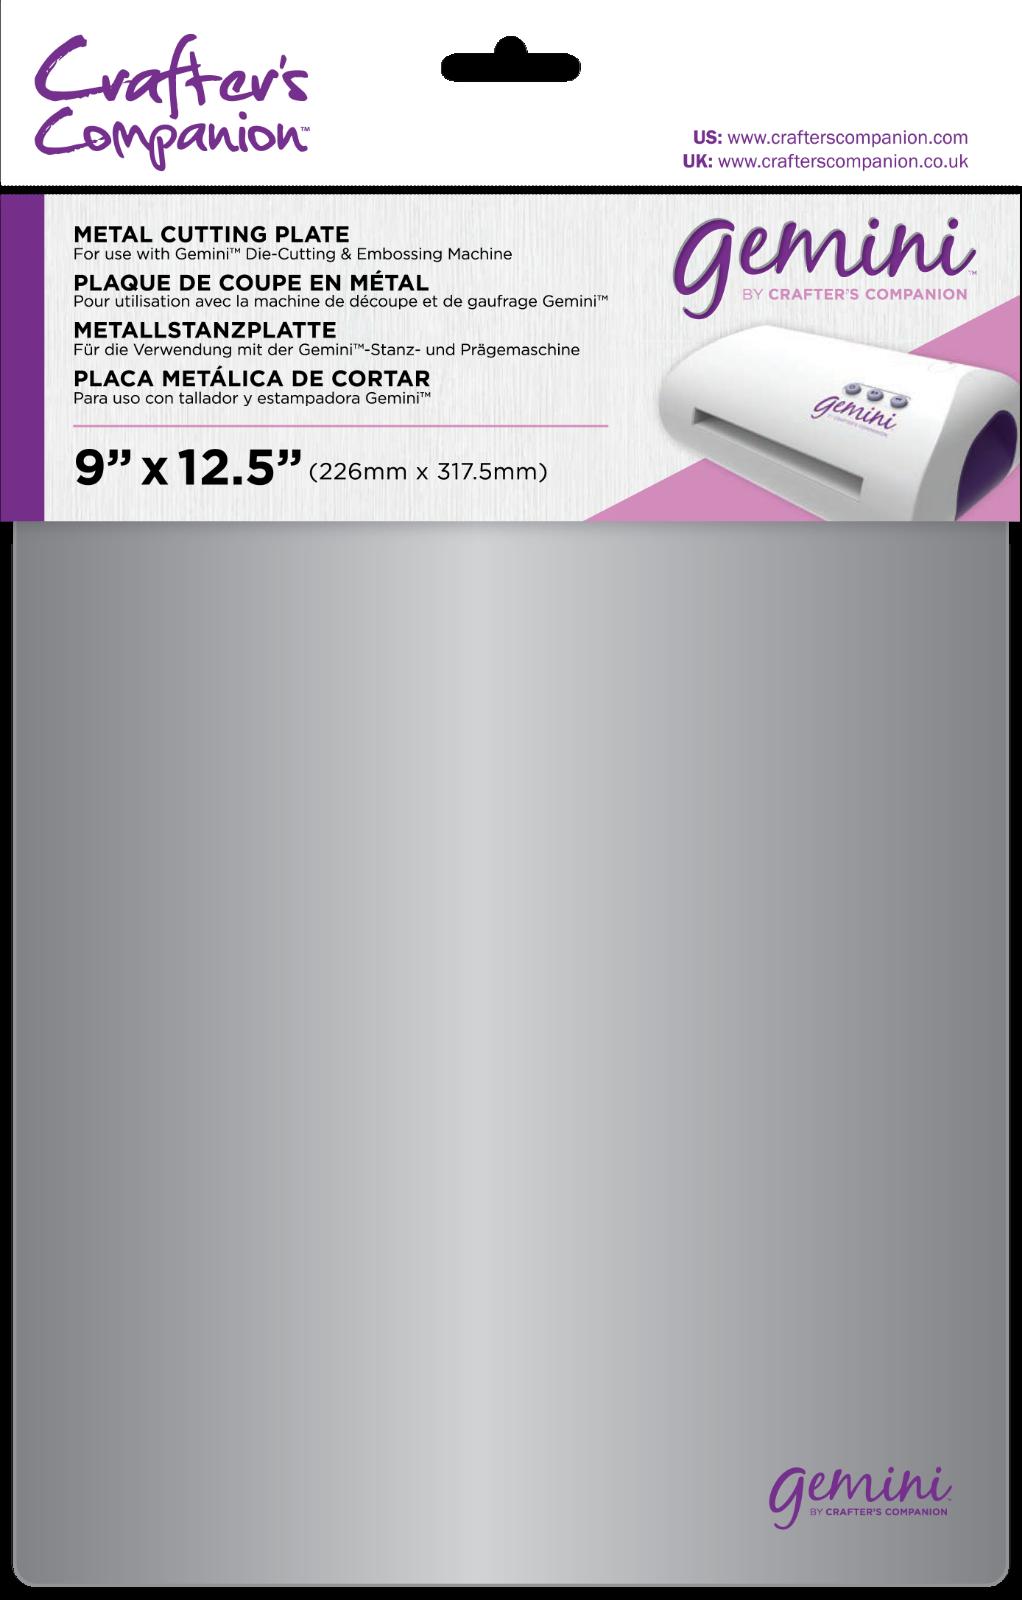 CRAFTWELL eBosser A4 Embossing Folder SWIRLTANGLE  EF-SWT-028A 210mm x 297mm